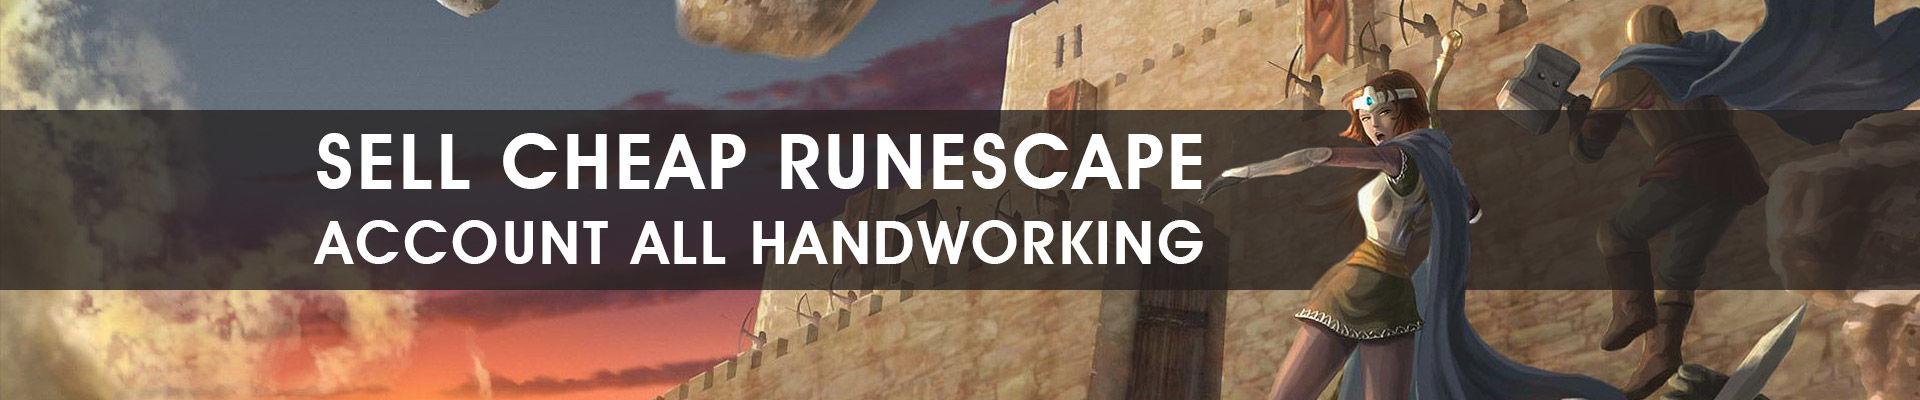 Sell Cheap Runescape Account All Handworking